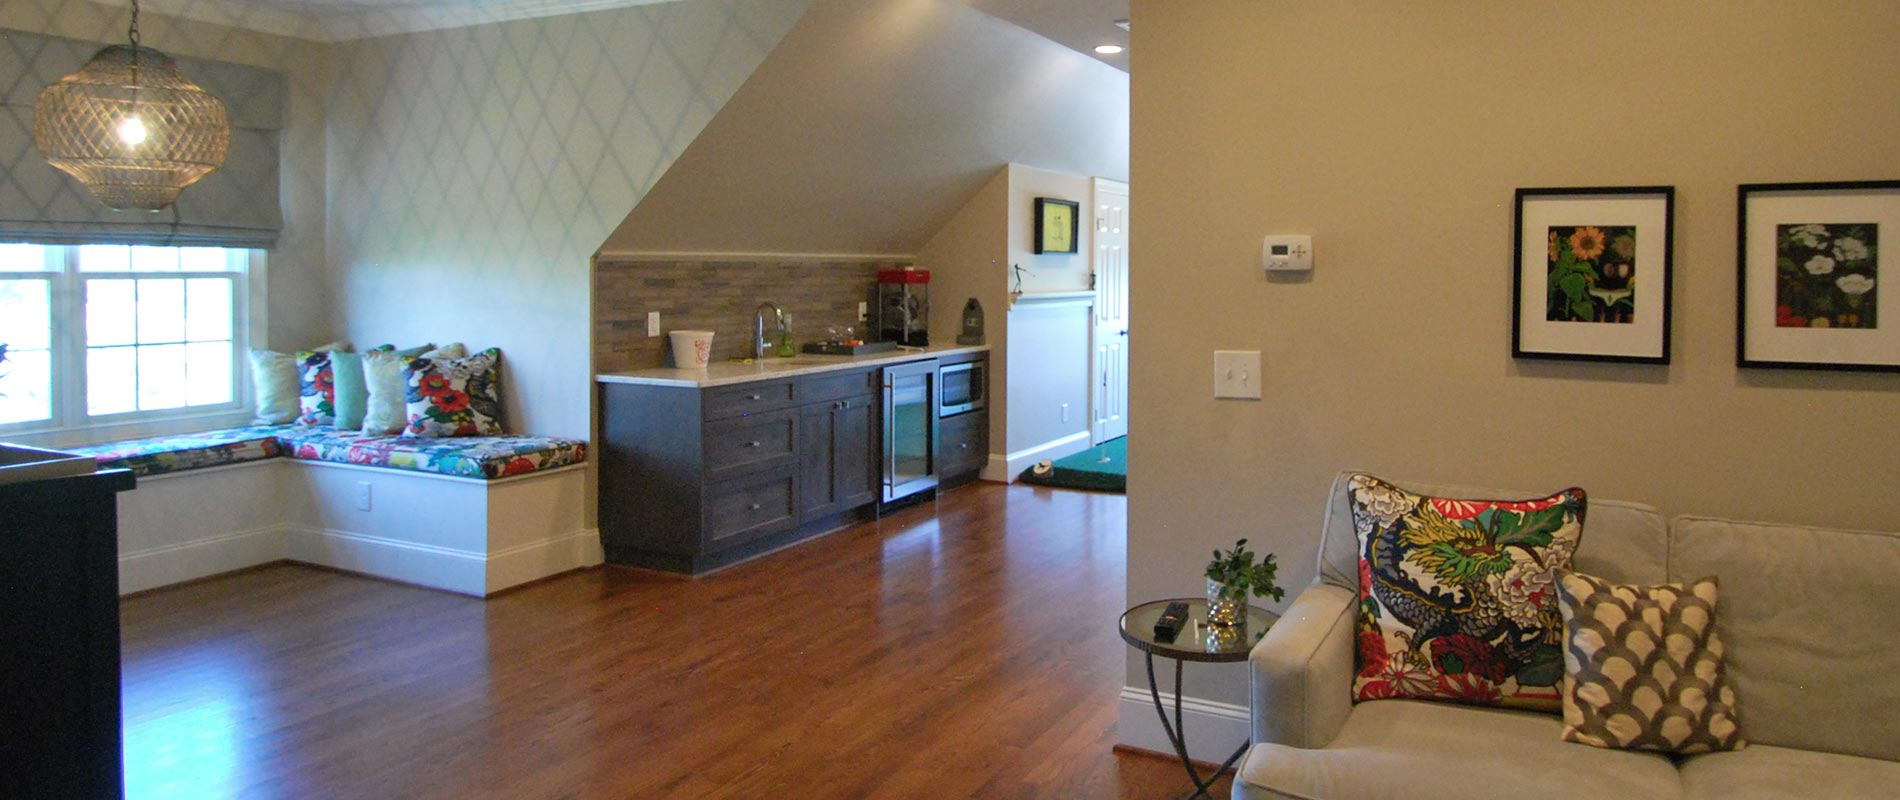 Living Room Renovation   Complete Construction Company   Apex, NC